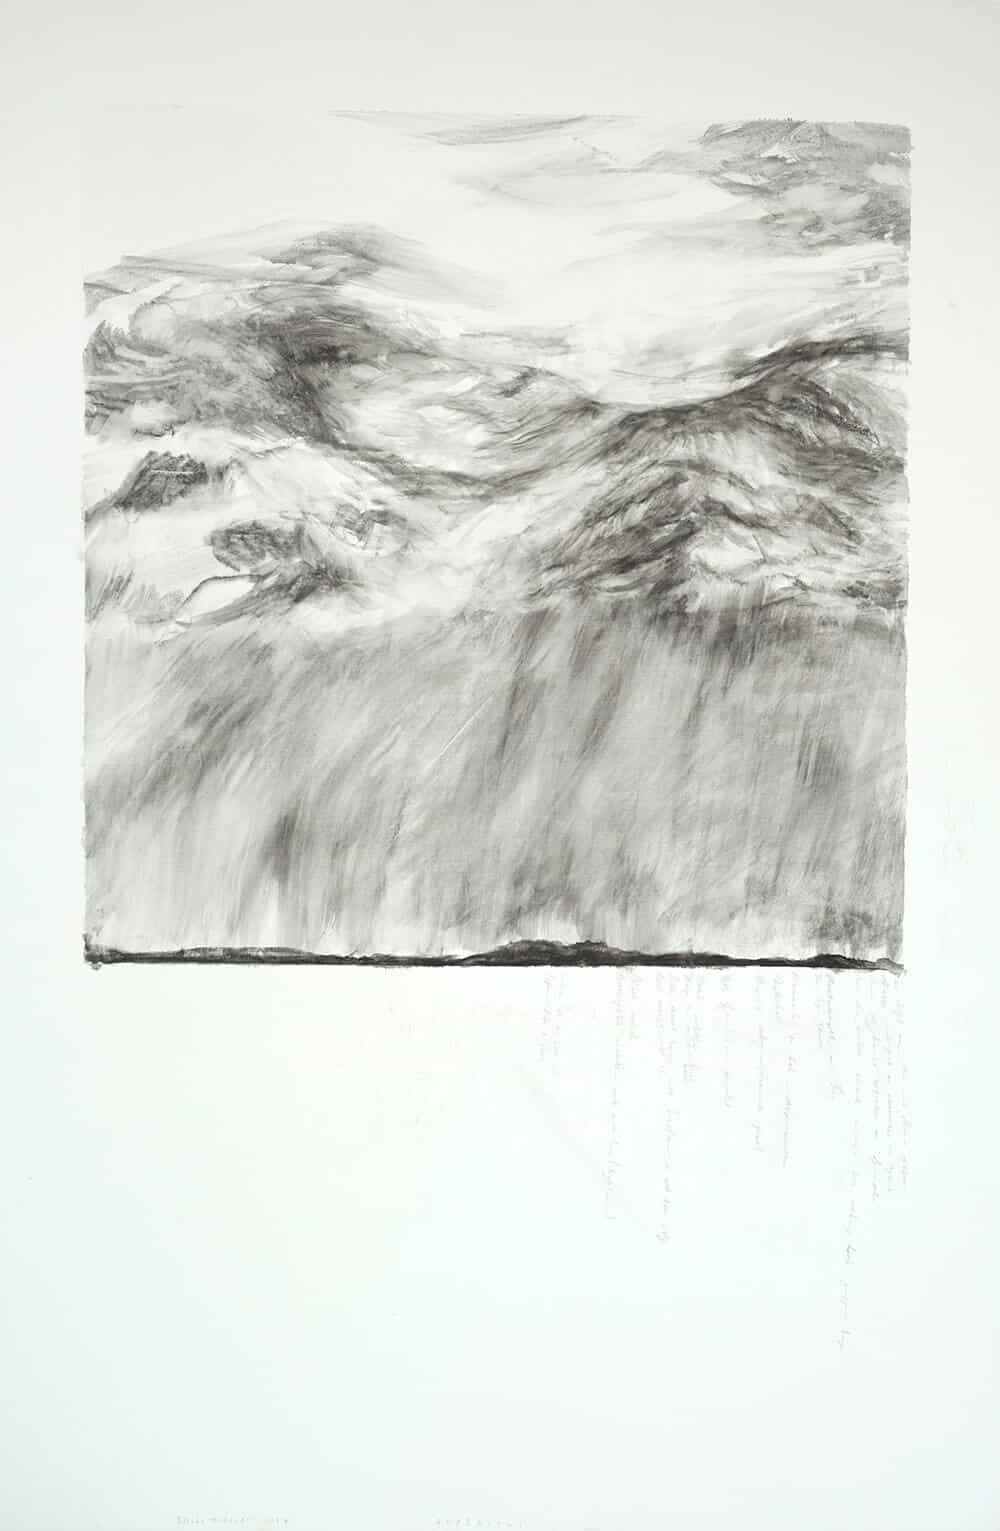 Elsabé Milandri, Asperitus, 2017. Graphite on Italian Cotton, 150x 100cm. Courtesy of the artist & SMITH.